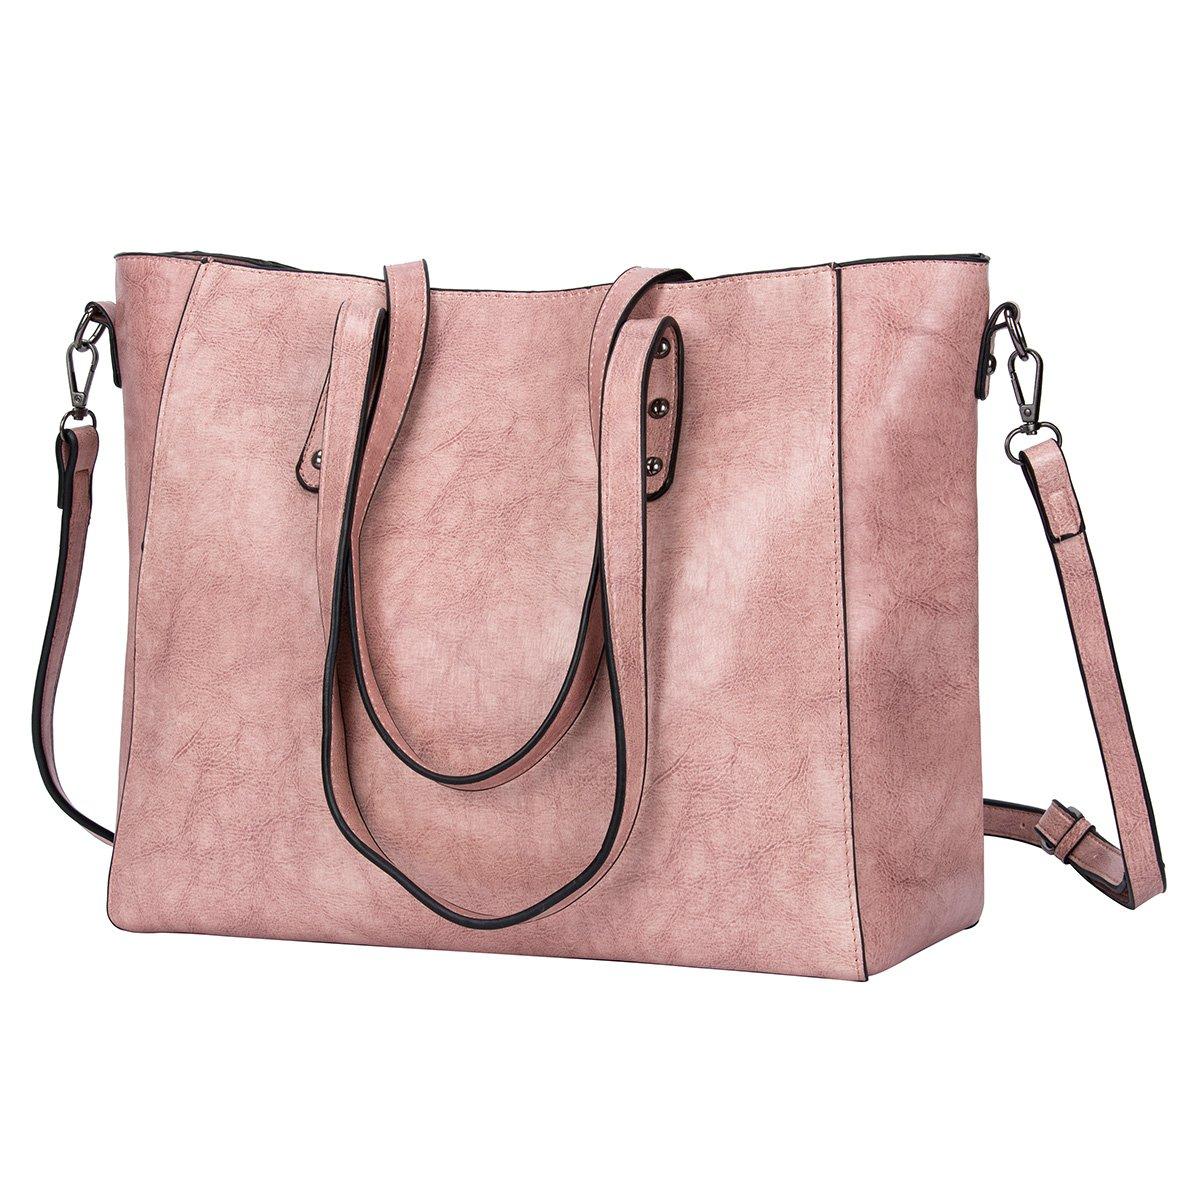 Women Top Handle Satchel Handbags Shoulder Bags Tote Purse